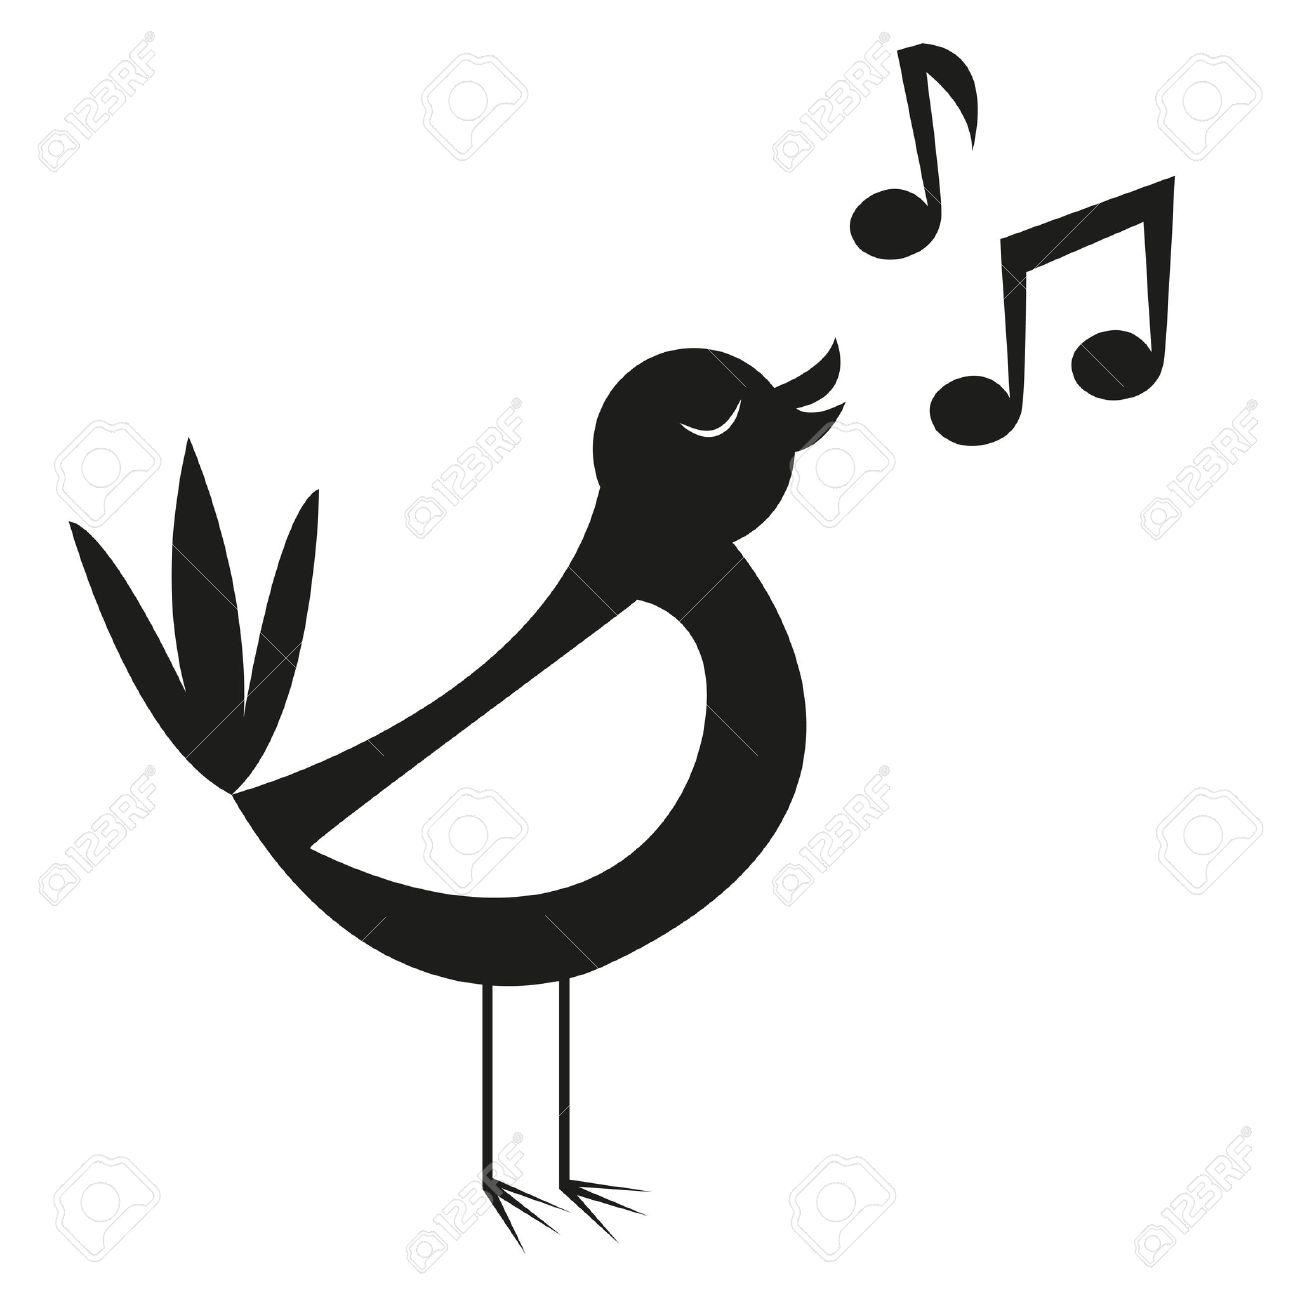 Vector Cute Black And White Cartoon Bird Singing - 30334346